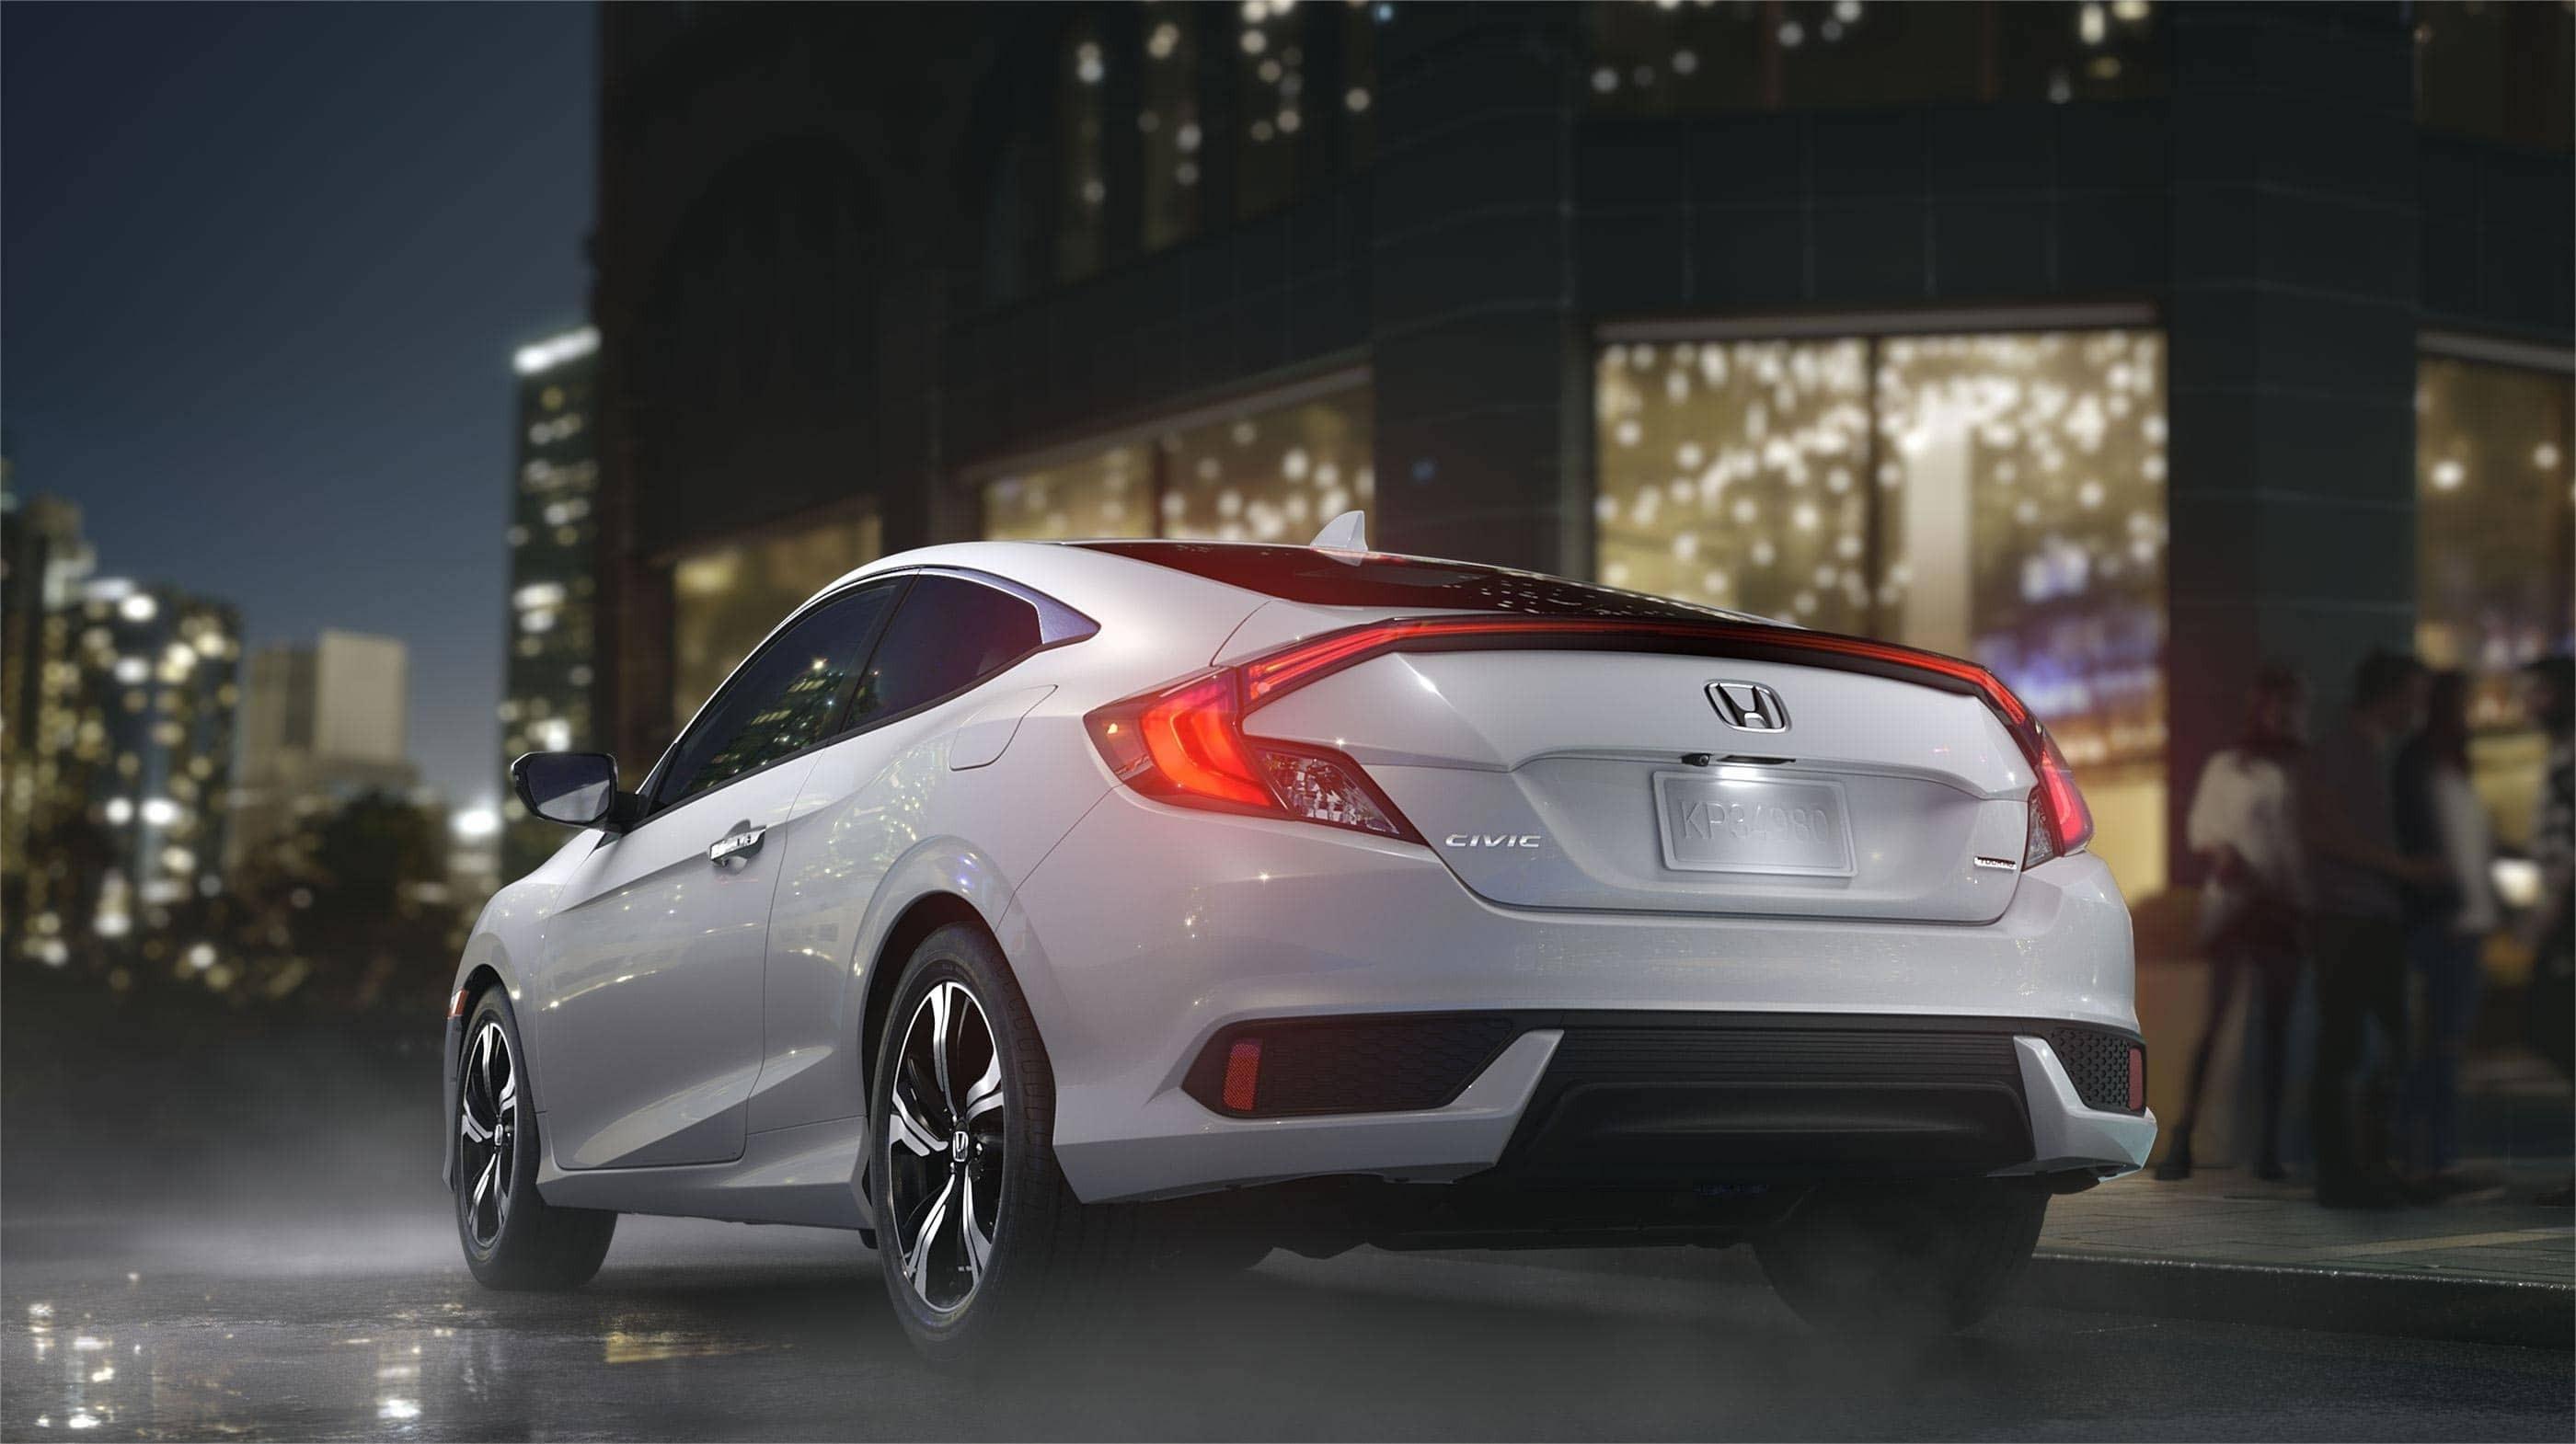 2017 Honda Civic Coupe White Rear Exterior